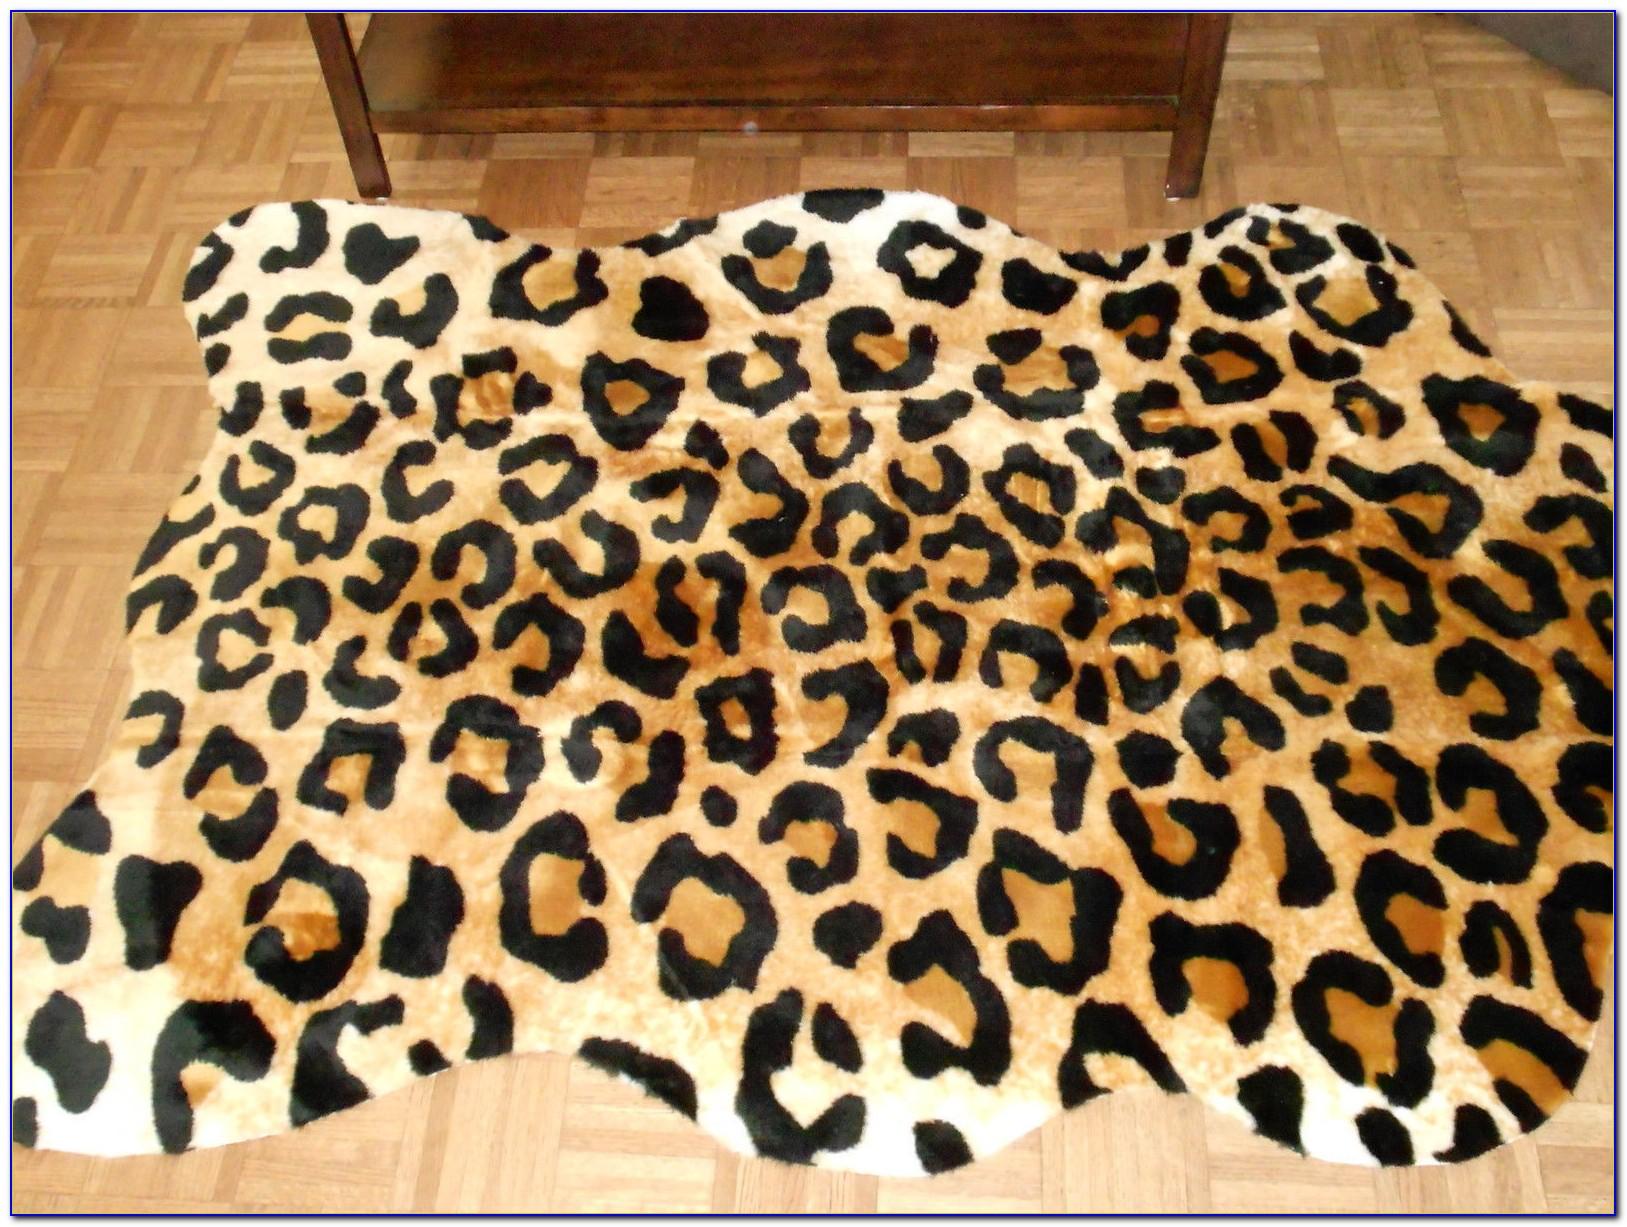 Faux animal skin rugs uk rugs home design ideas - Faux animal skin rugs ...